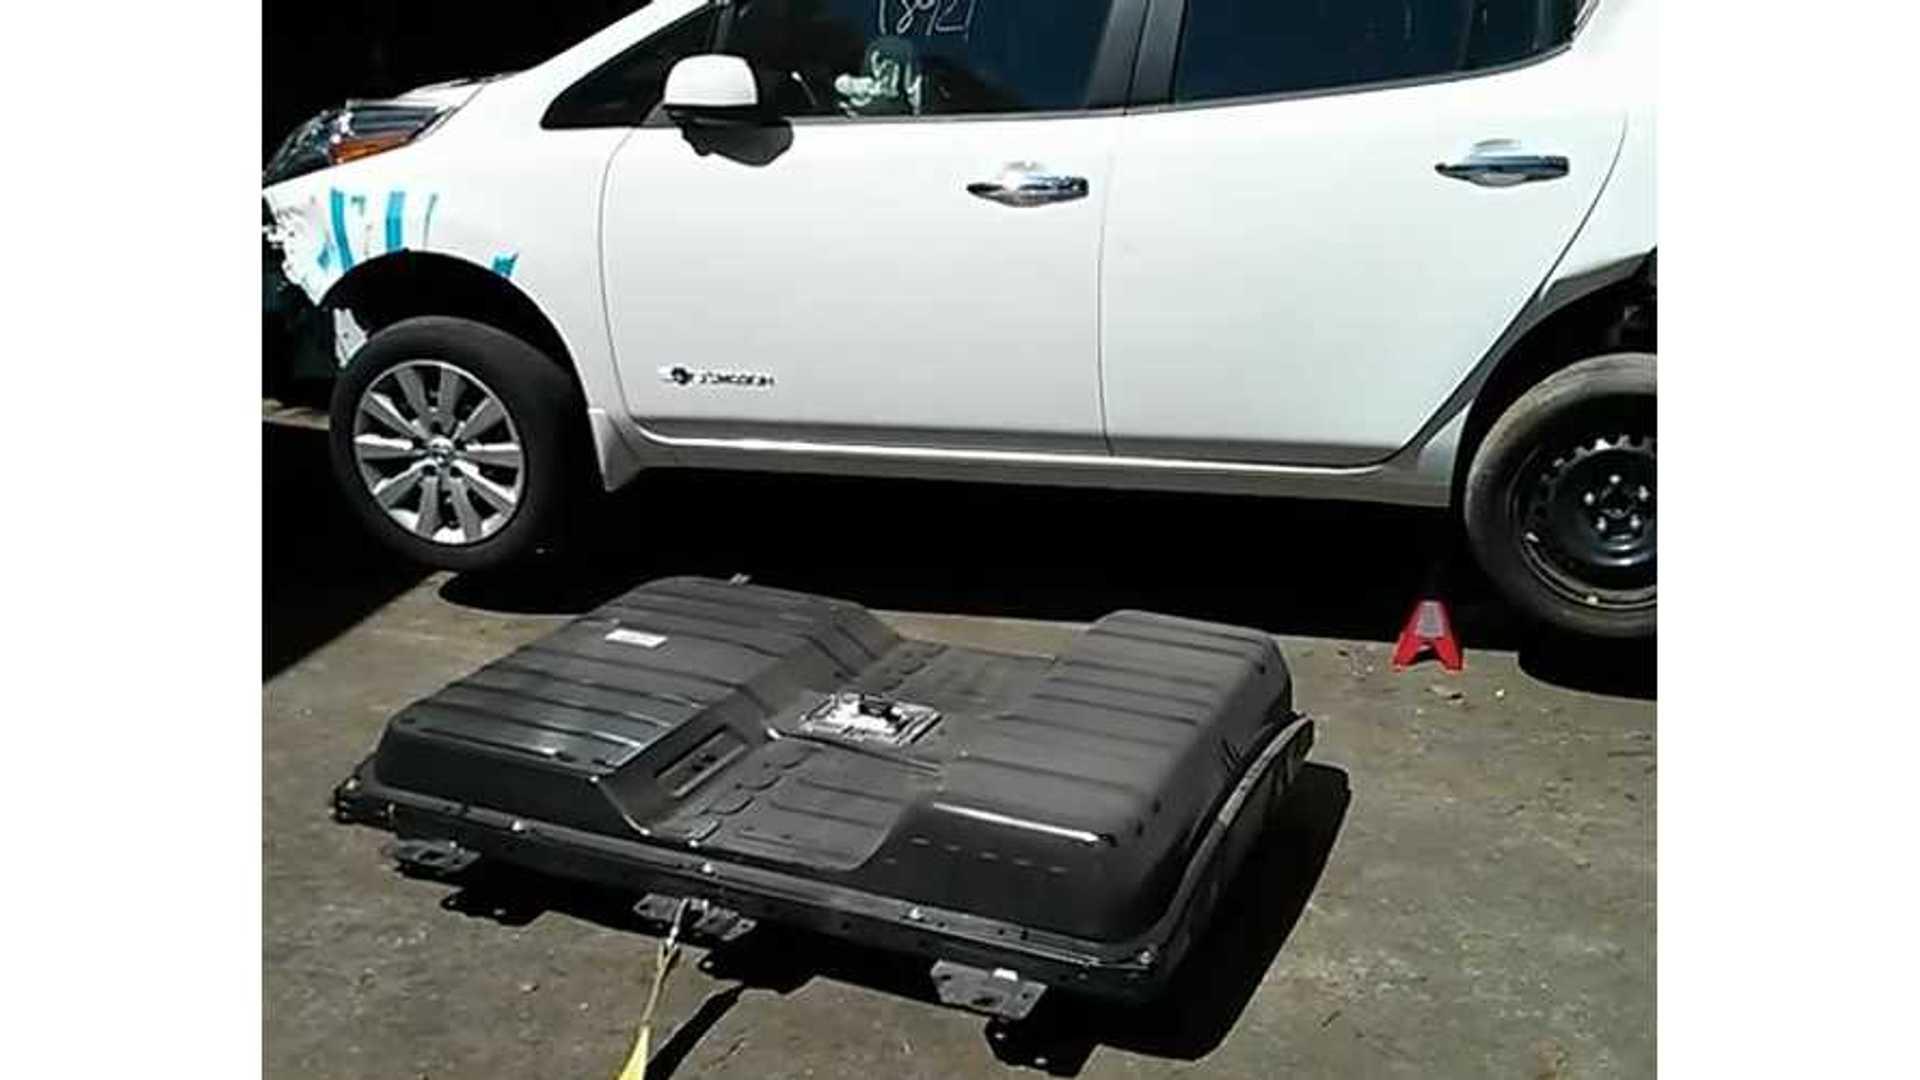 Nissan LEAF DIY Battery Removal - Video